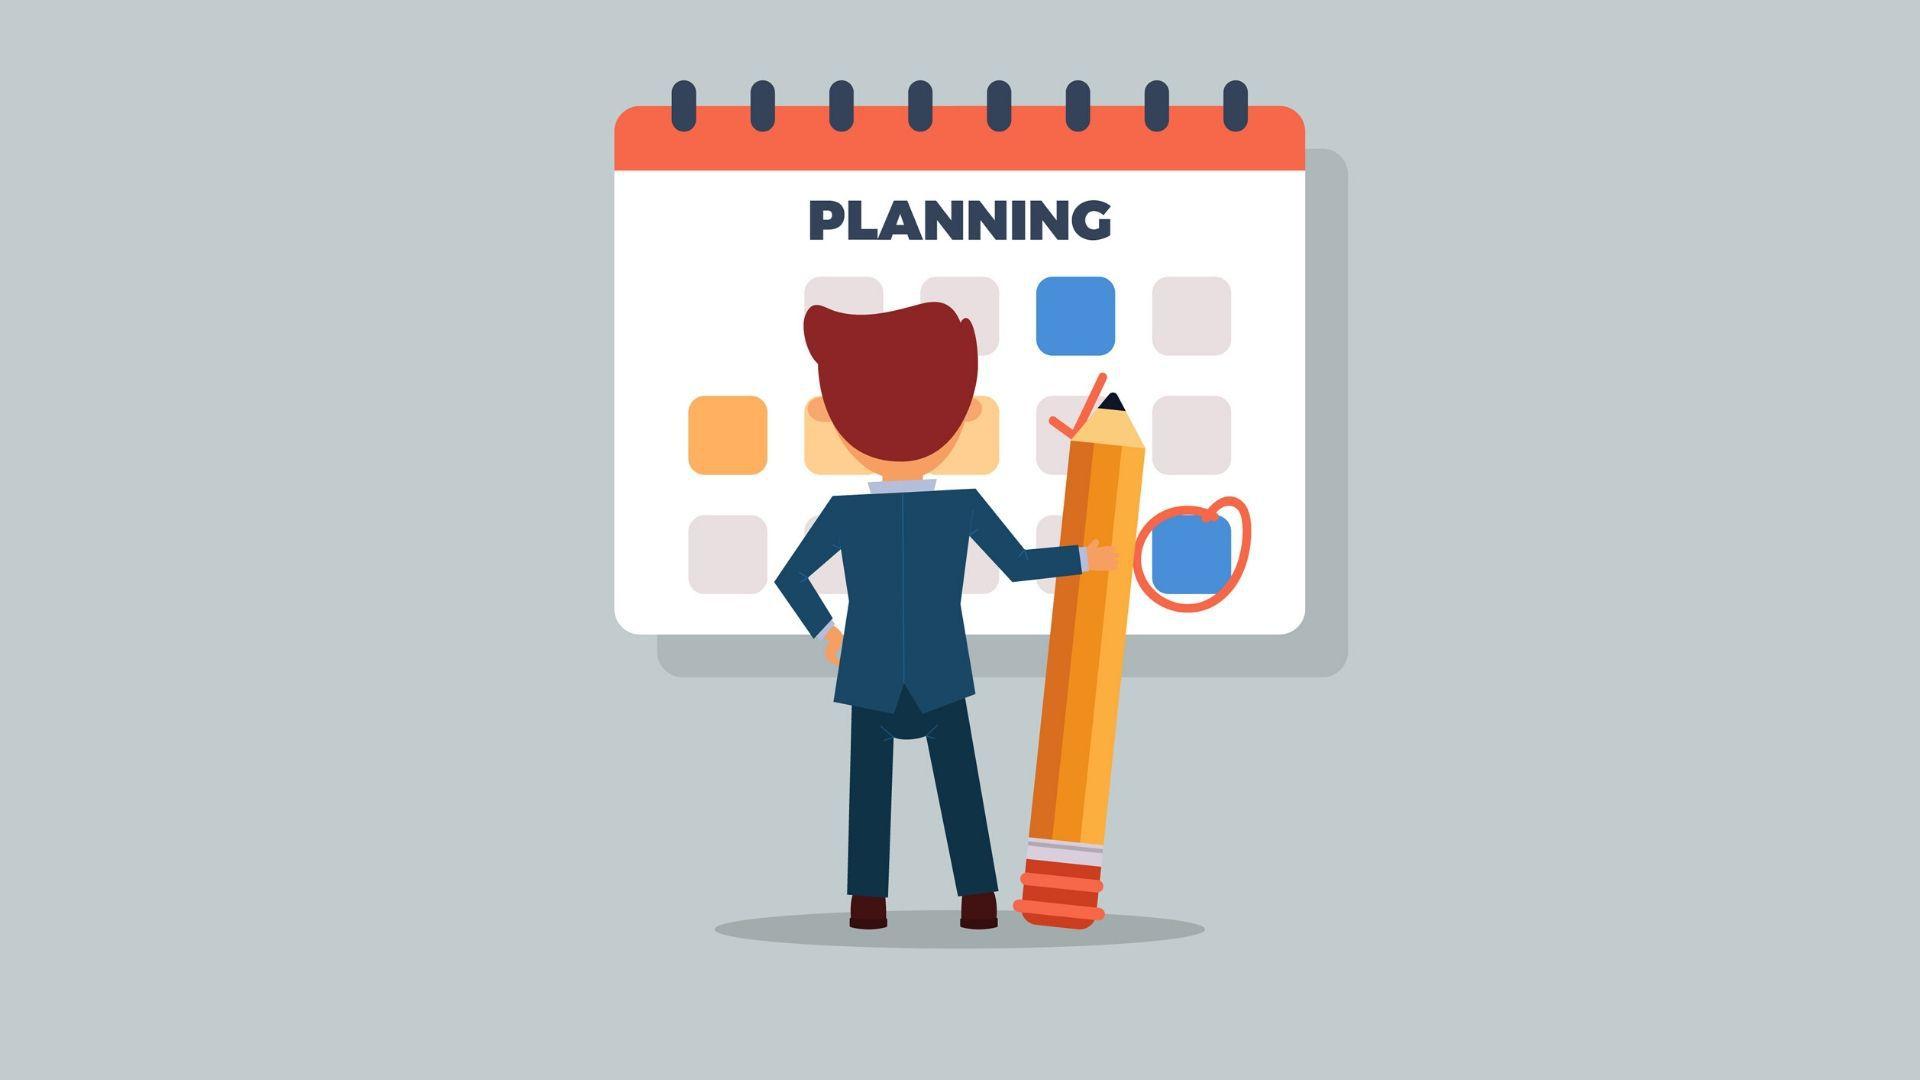 Planning Skills